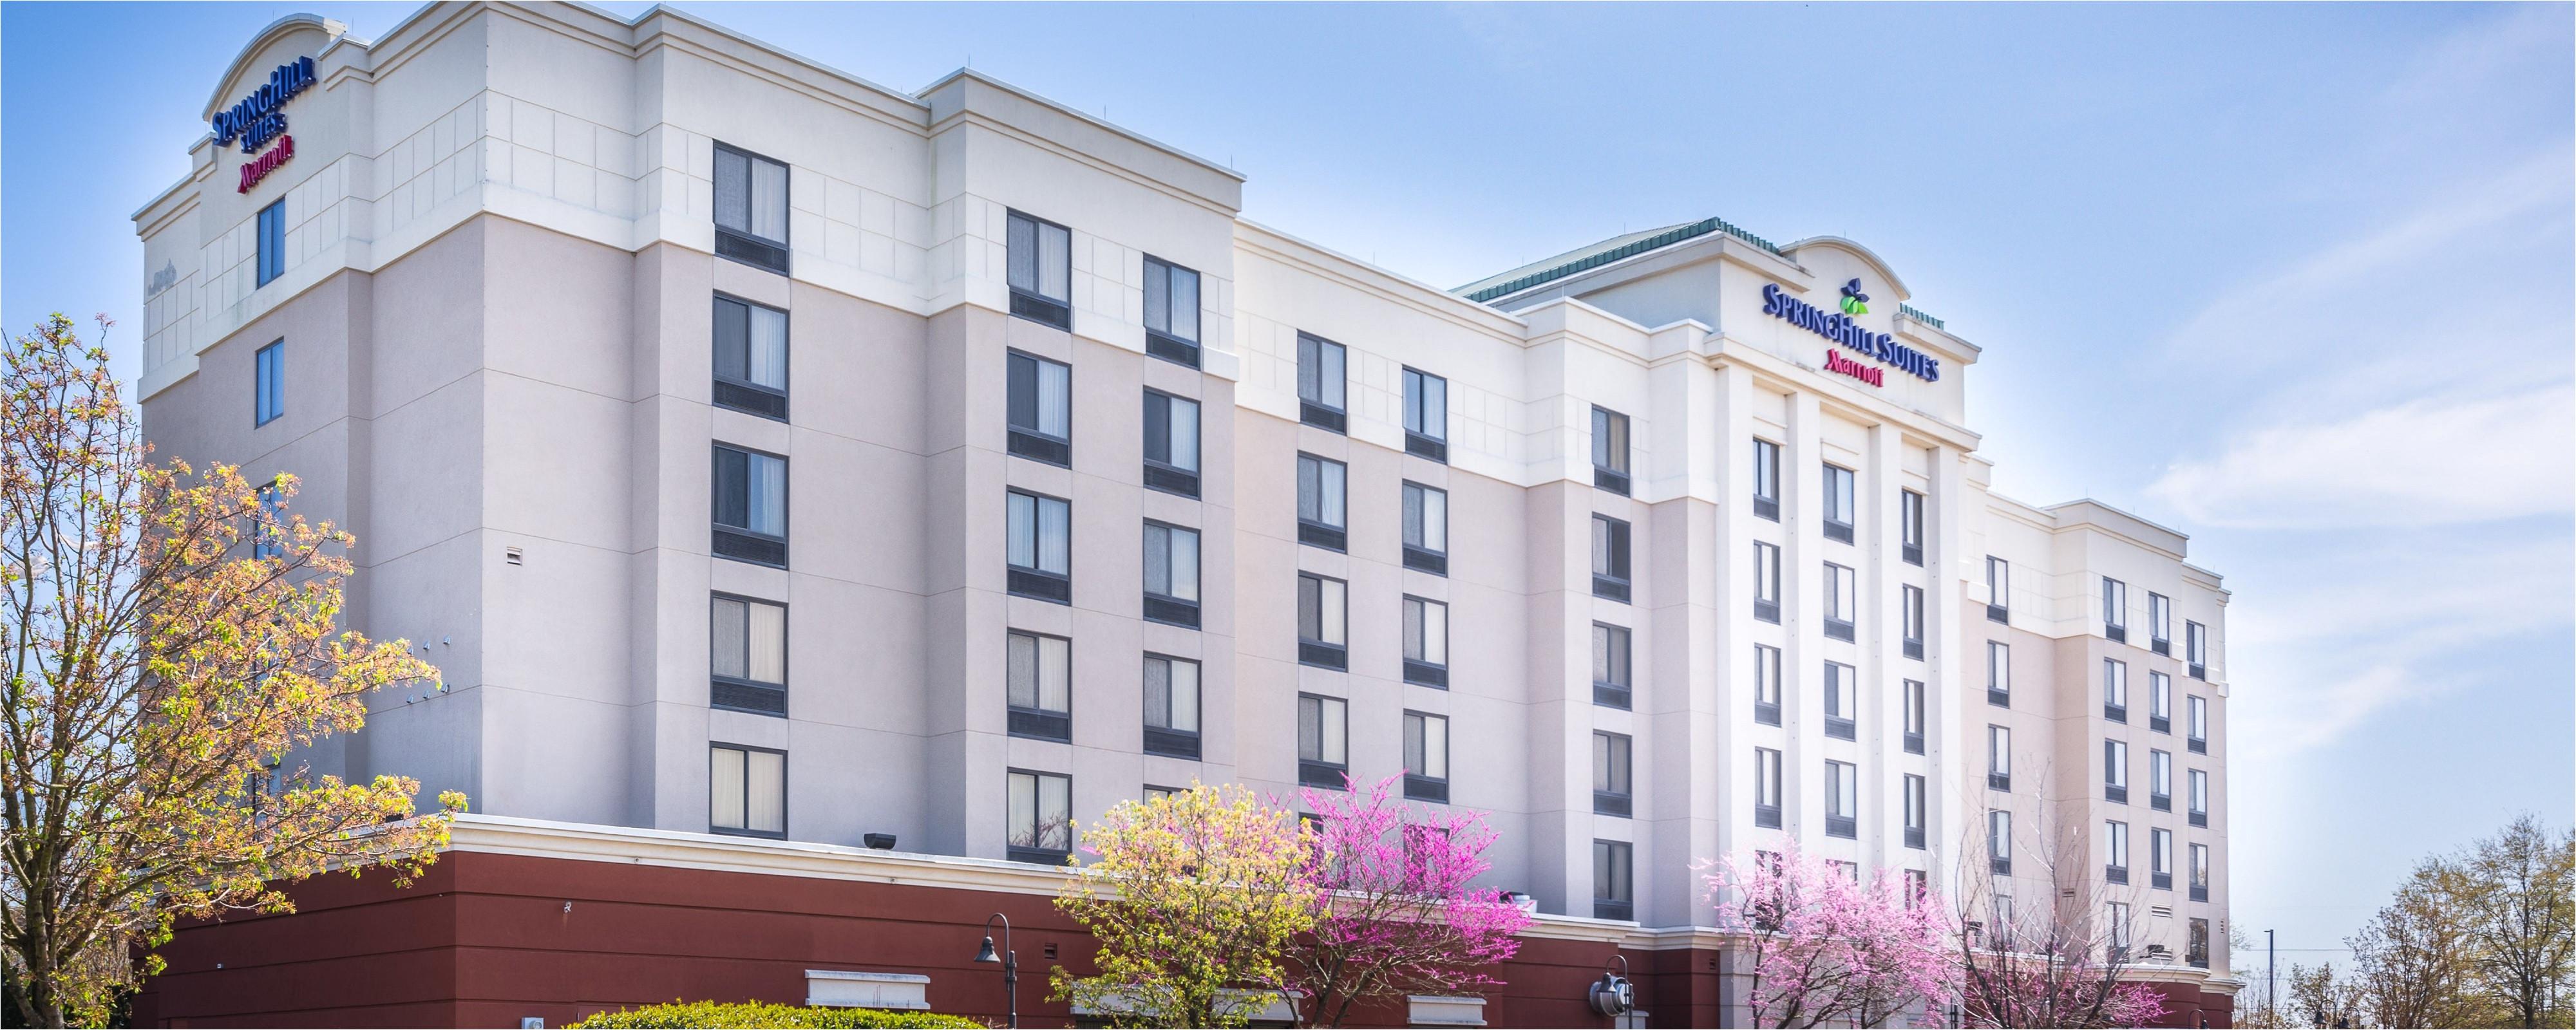 Bay Creek Apartments Hampton Va Hotel In norfolk Va Springhill Suites norfolk